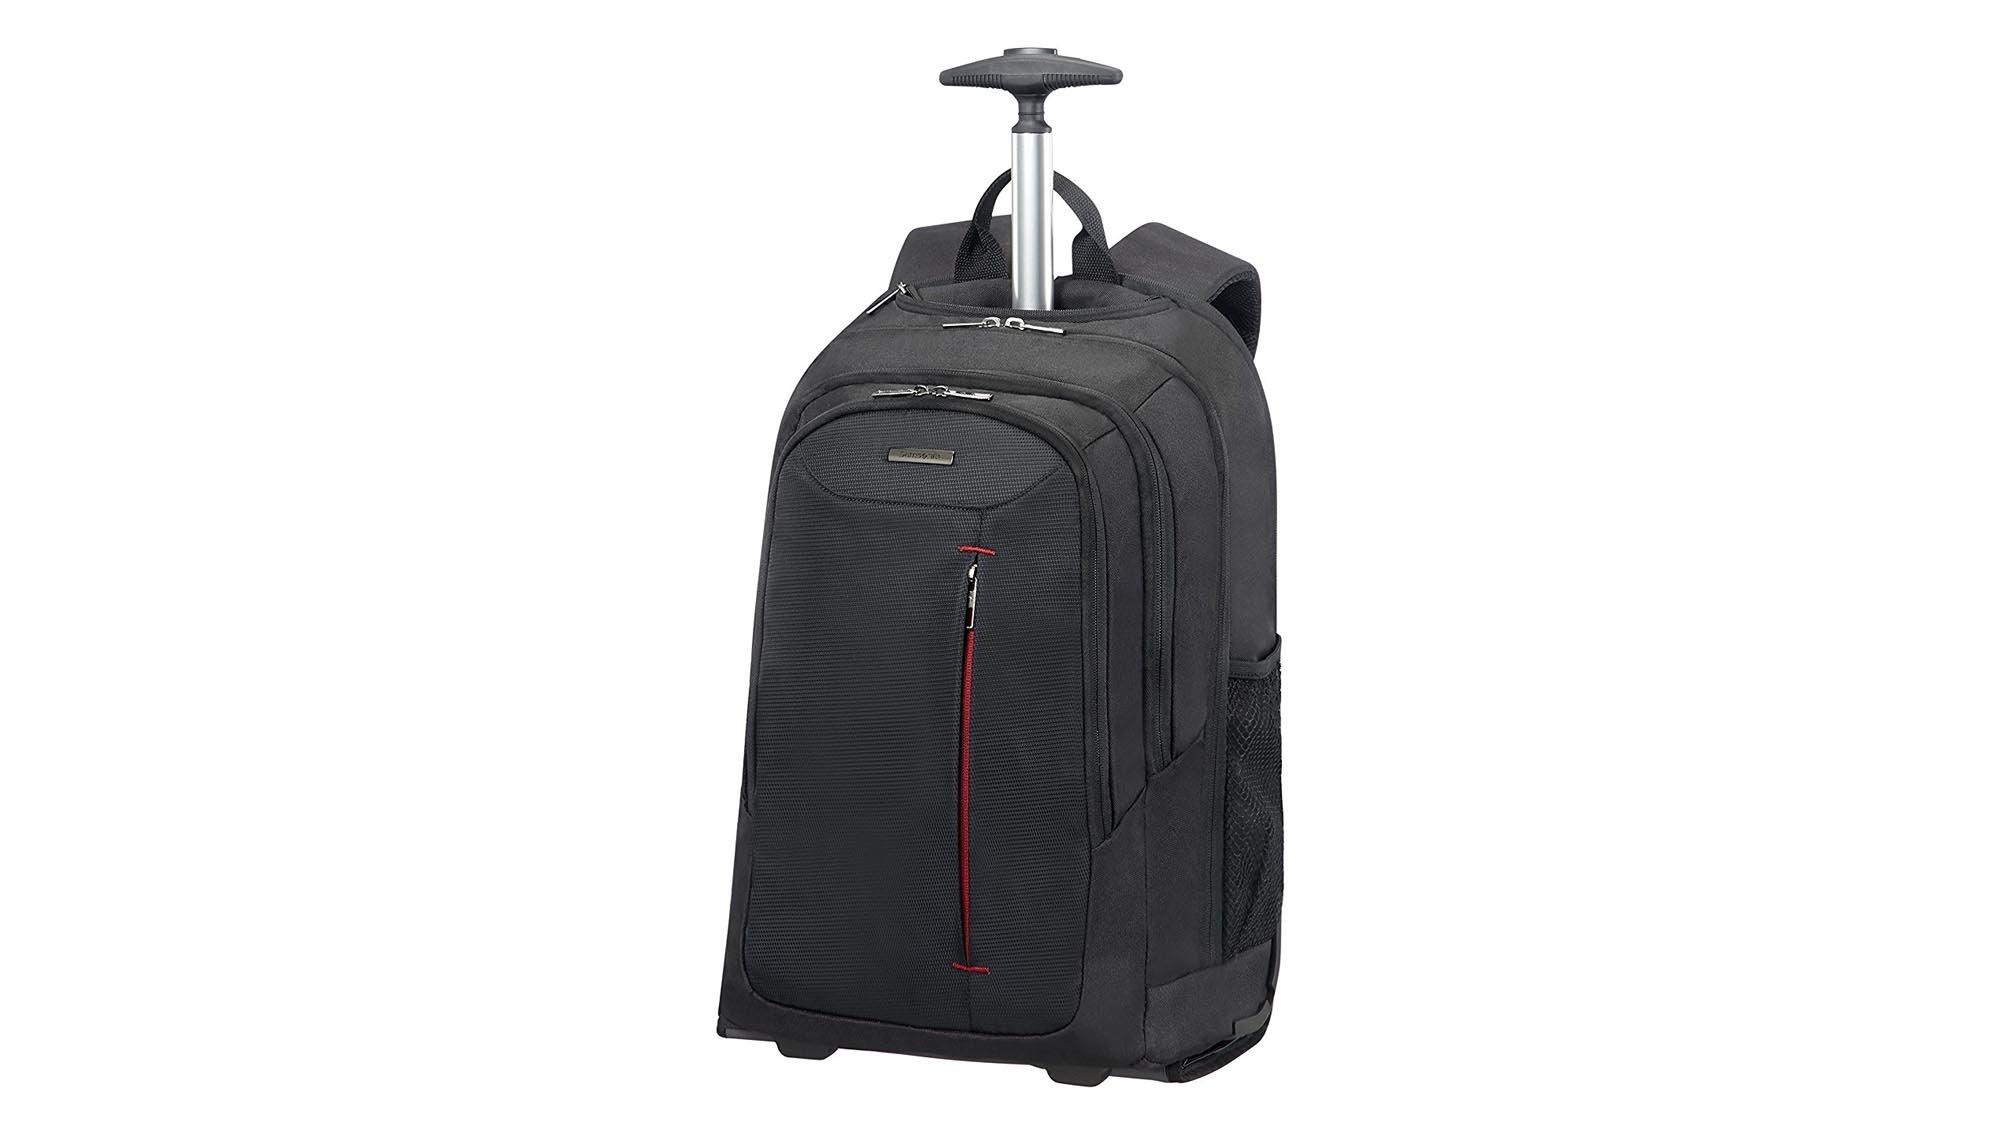 Best Laptop Sleeve For Travel